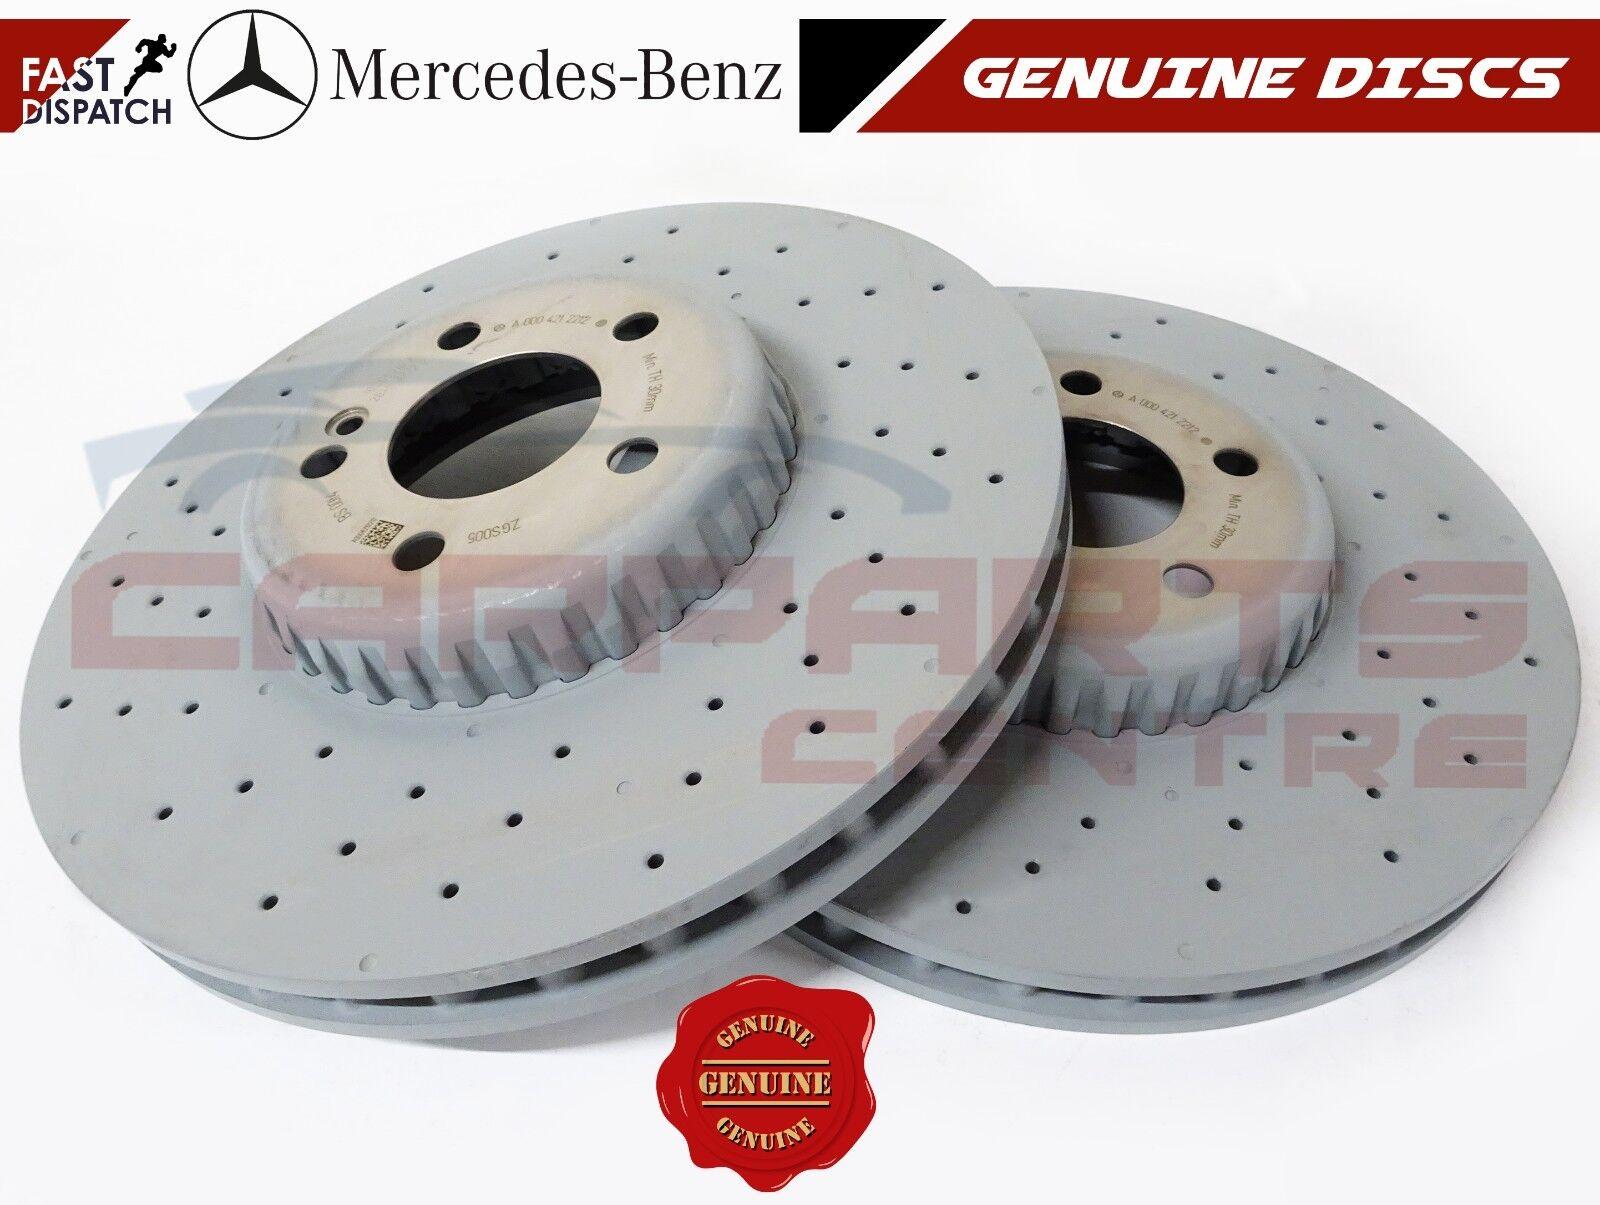 Fits Mercedes C-Class W205 C 220 BlueTEC Front Vented Brake Discs /& Pad Kit